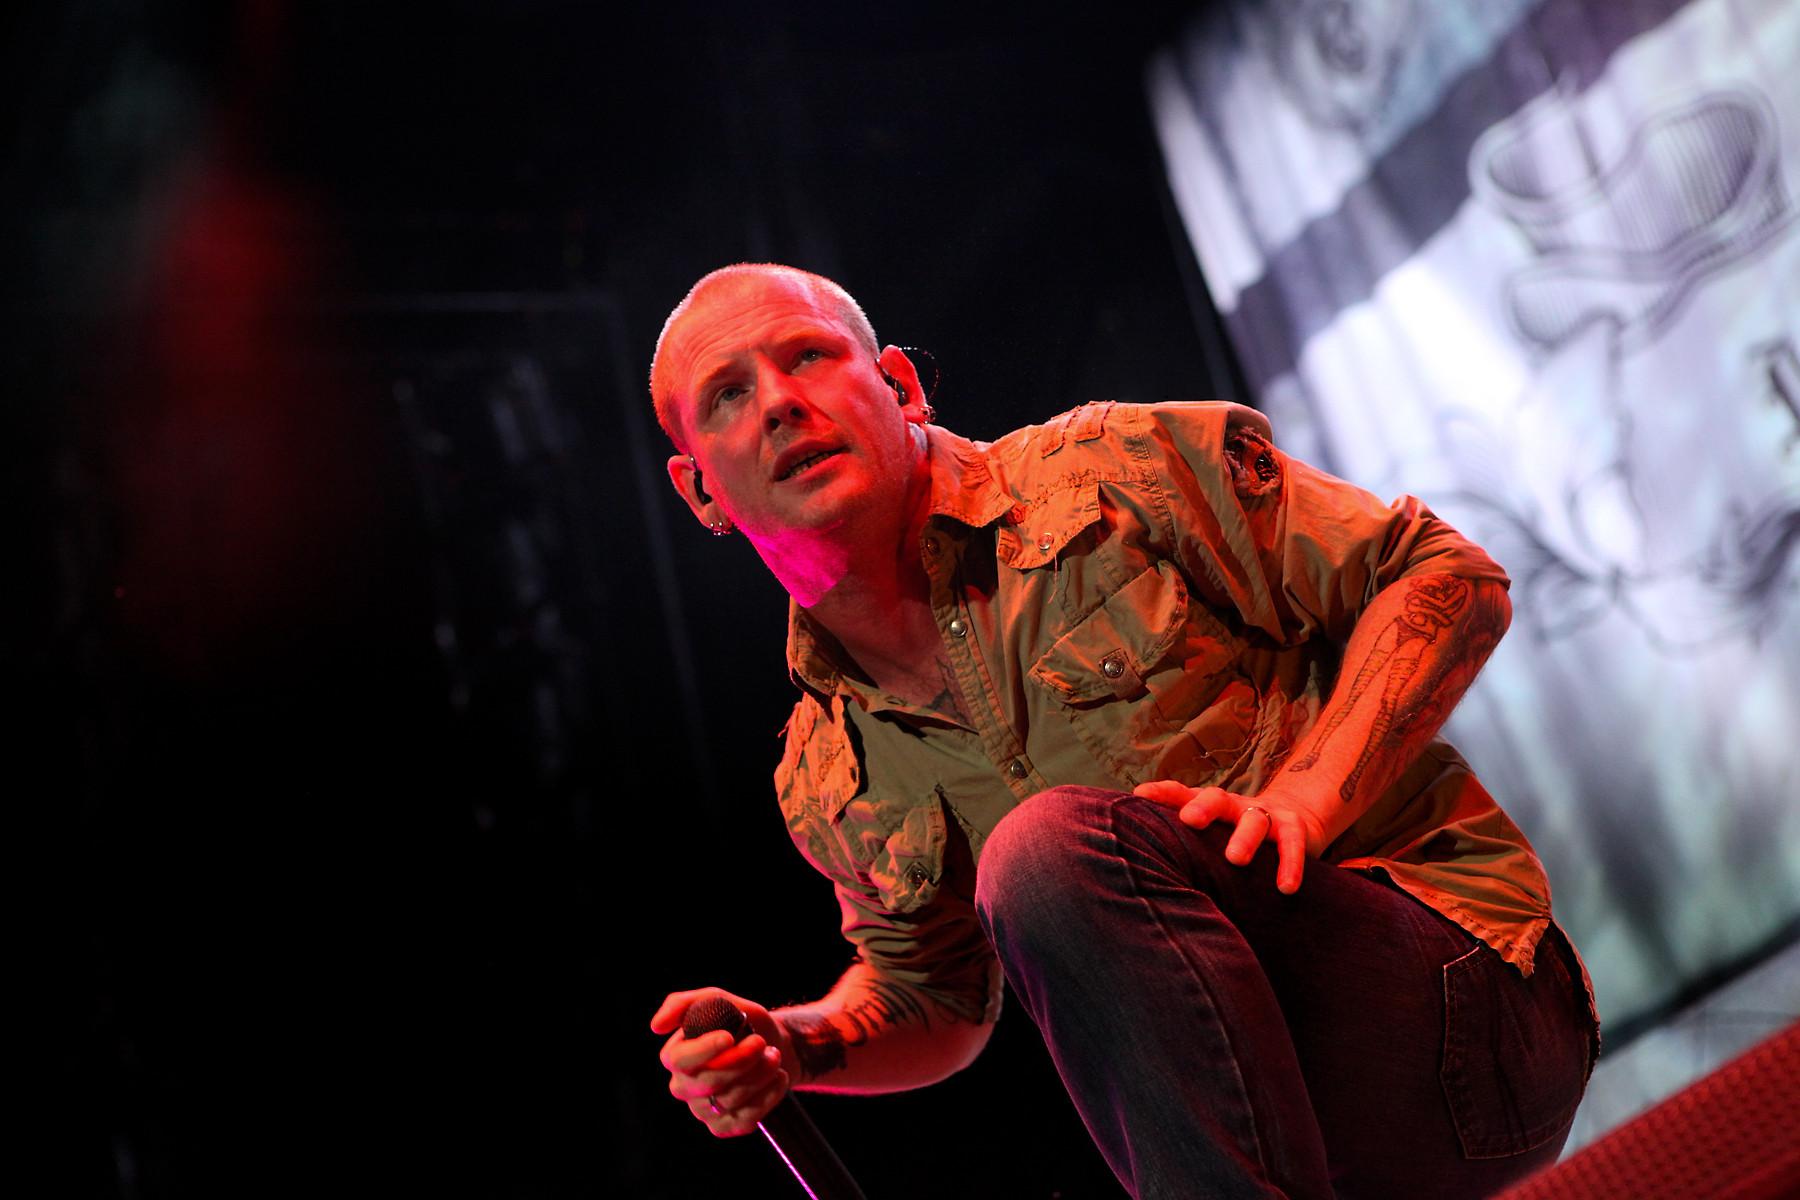 Stone Sour @ Uproar Festival 2010